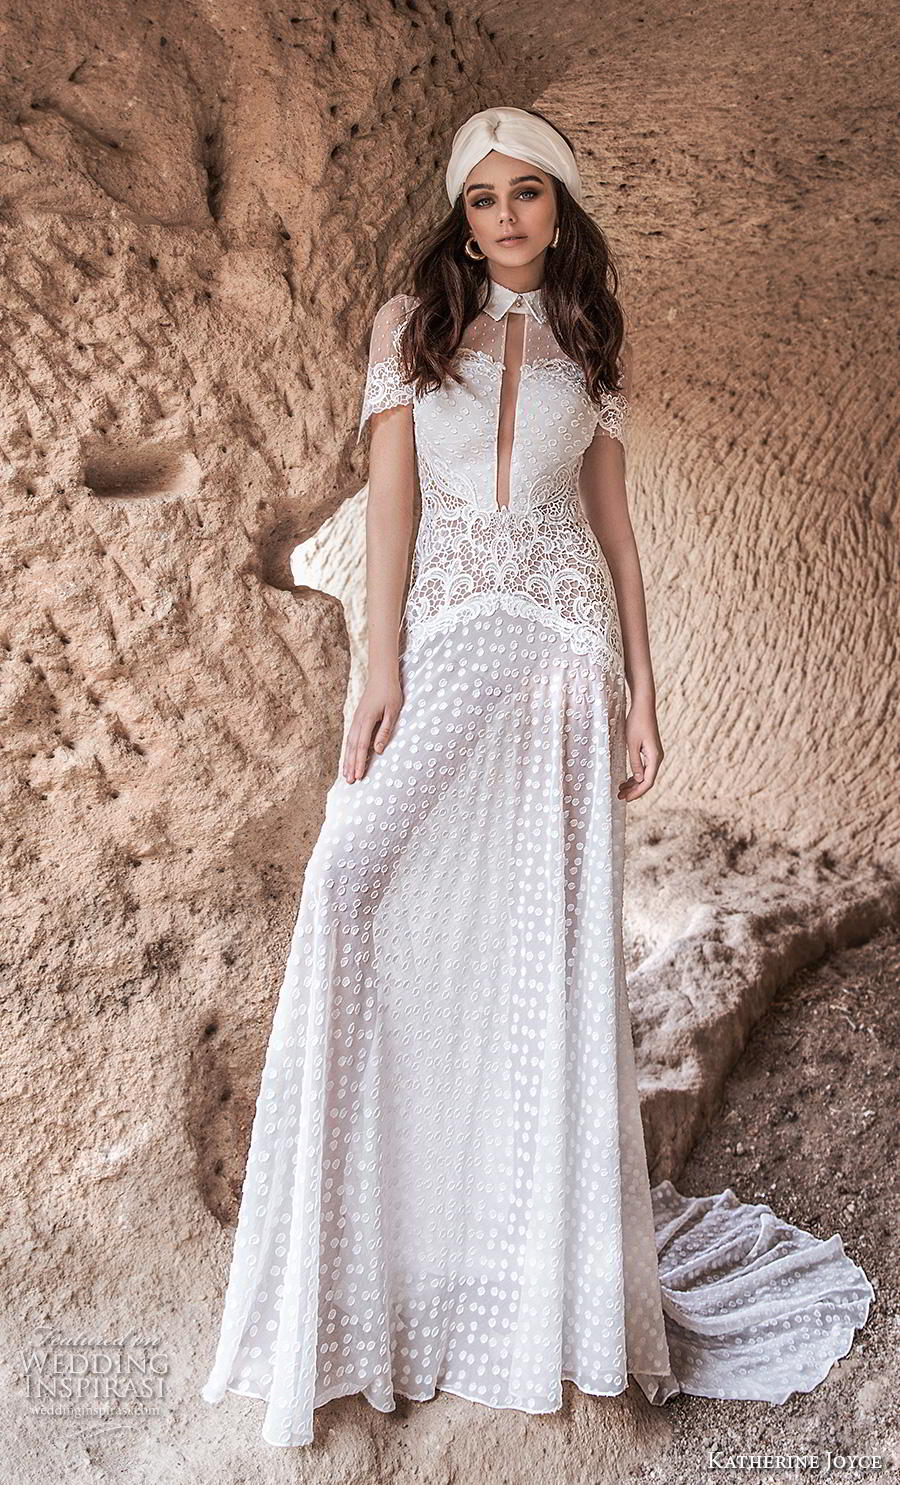 katherine joyce 2020 bridal short sleeves high collar neck slit bodice full embellishment bohemian soft a  line wedding dress keyhole back chapel train (8) mv